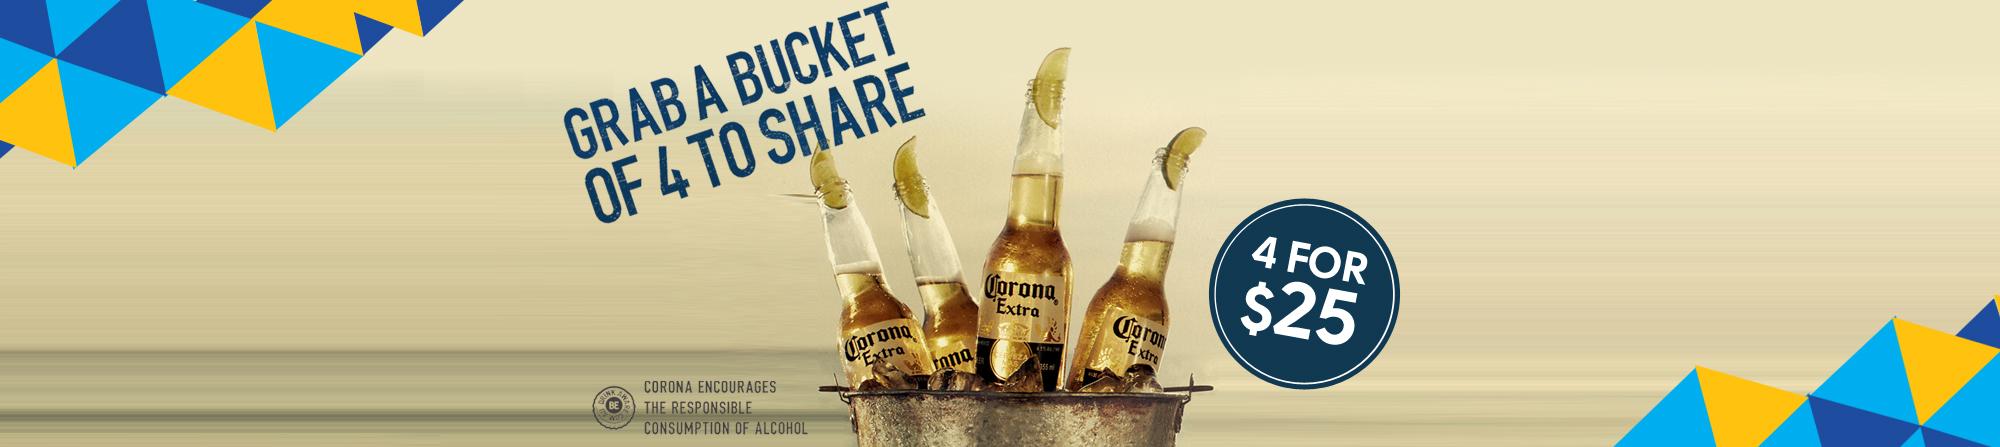 Corona-buckets-Banner-Slider-2000x447